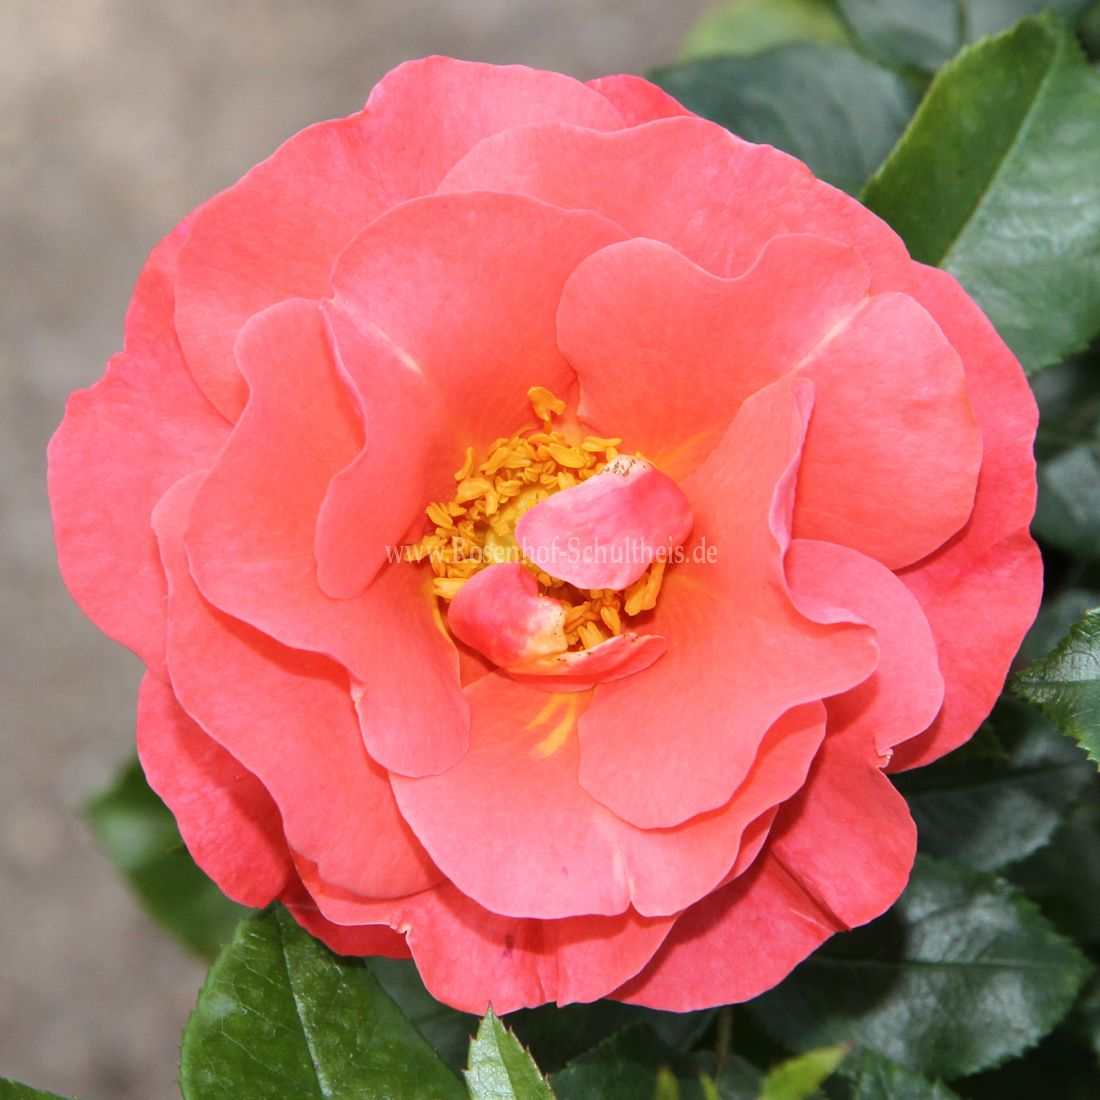 carl laemmle rose rosen online kaufen im rosenhof. Black Bedroom Furniture Sets. Home Design Ideas